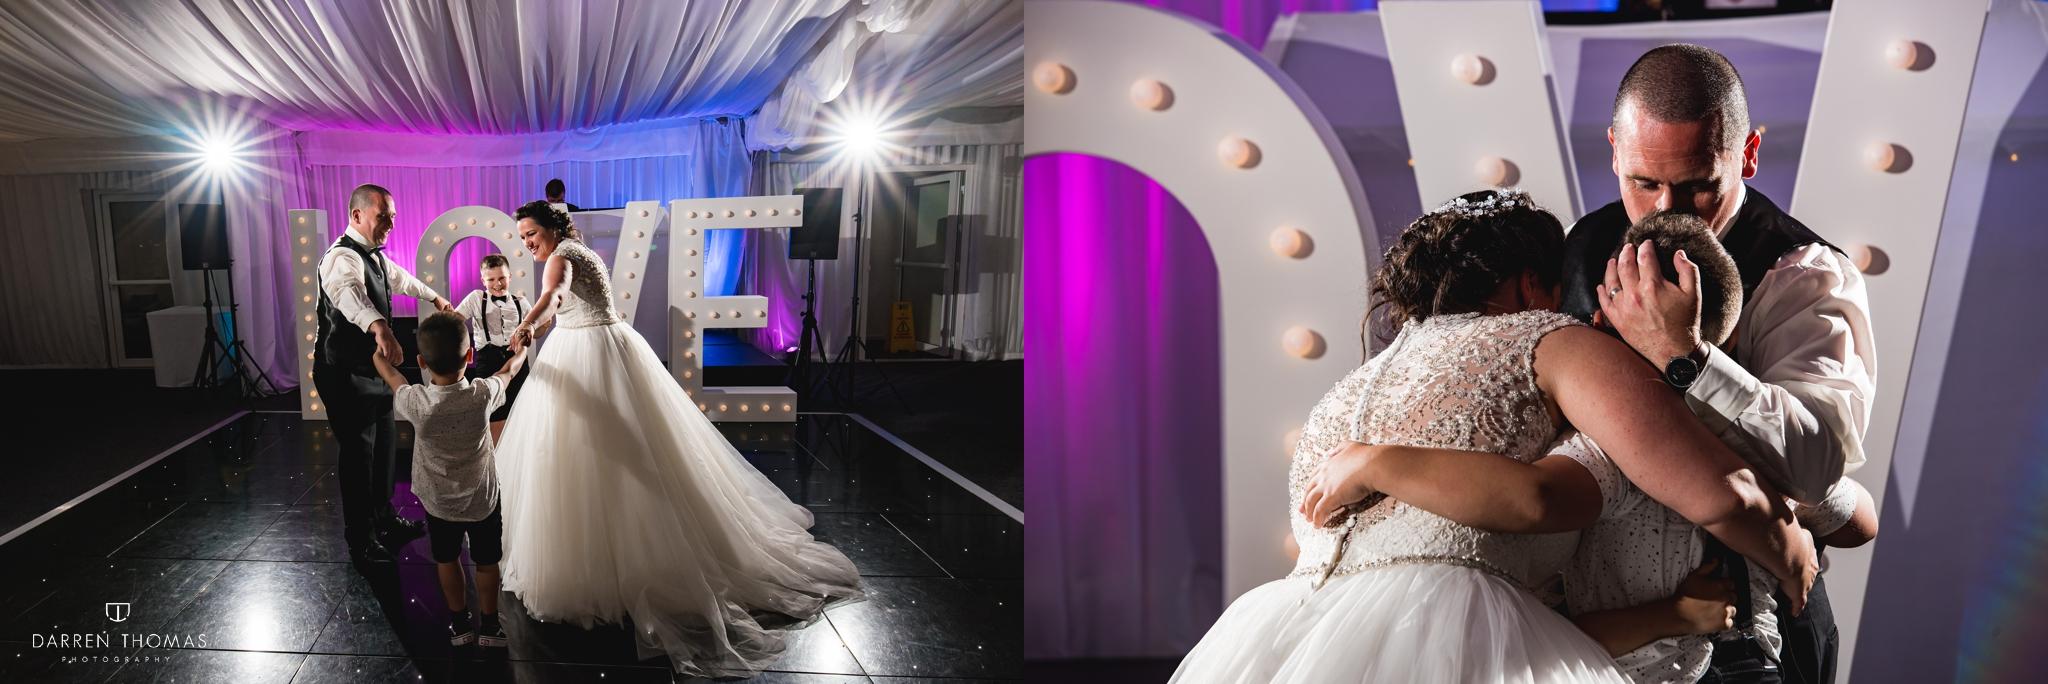 Llechwen-hall-wedding-photography21.jpg